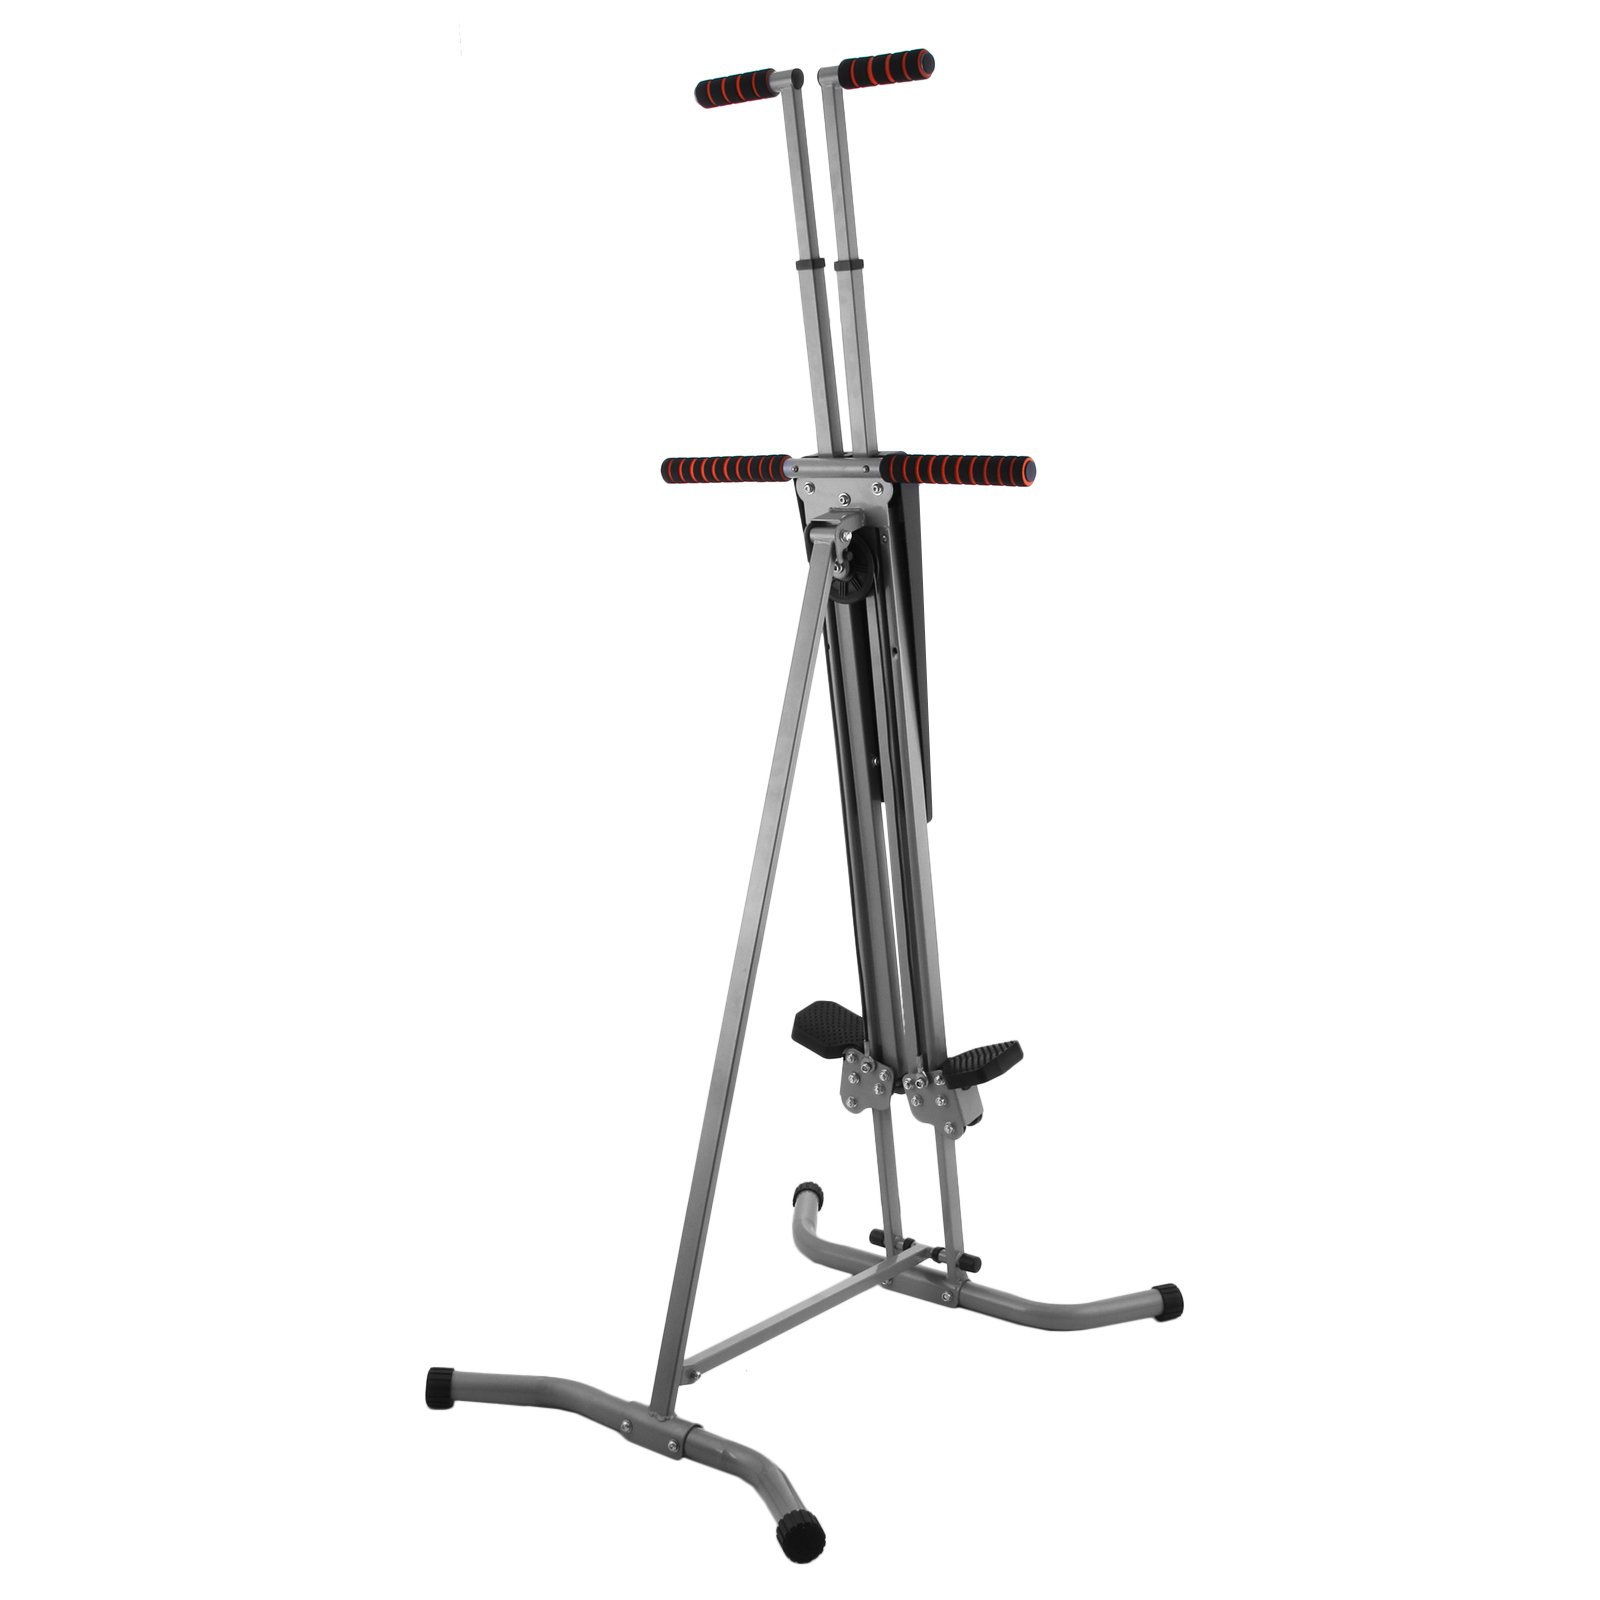 Popsport 440LBS Climber Machine Fitness Stepper Climber Exercise Equipment Vertical Climber for Home Gym Exercise Stepper Cardio Climbing System (P8006,Gray) by Popsport (Image #4)